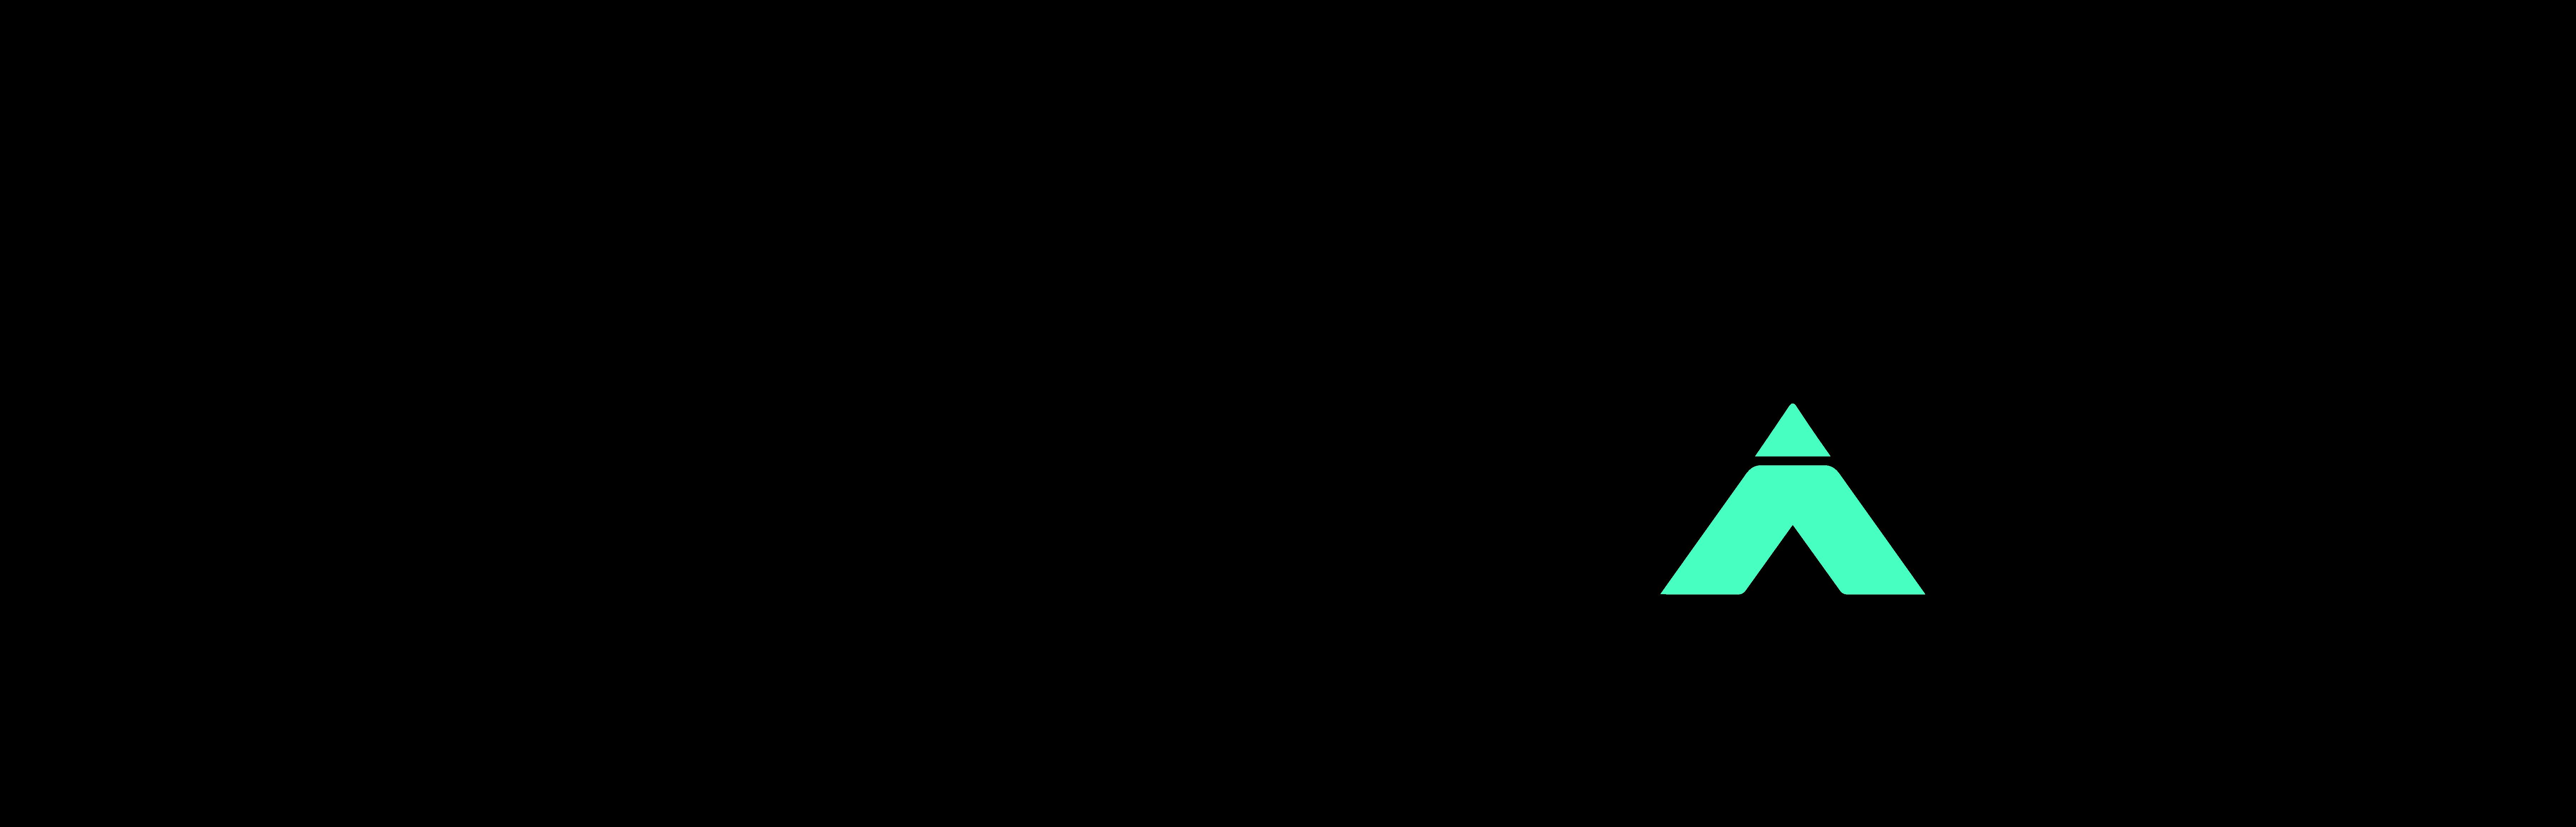 engixo vector logoslogan prancheta 1 2 - Affiliates